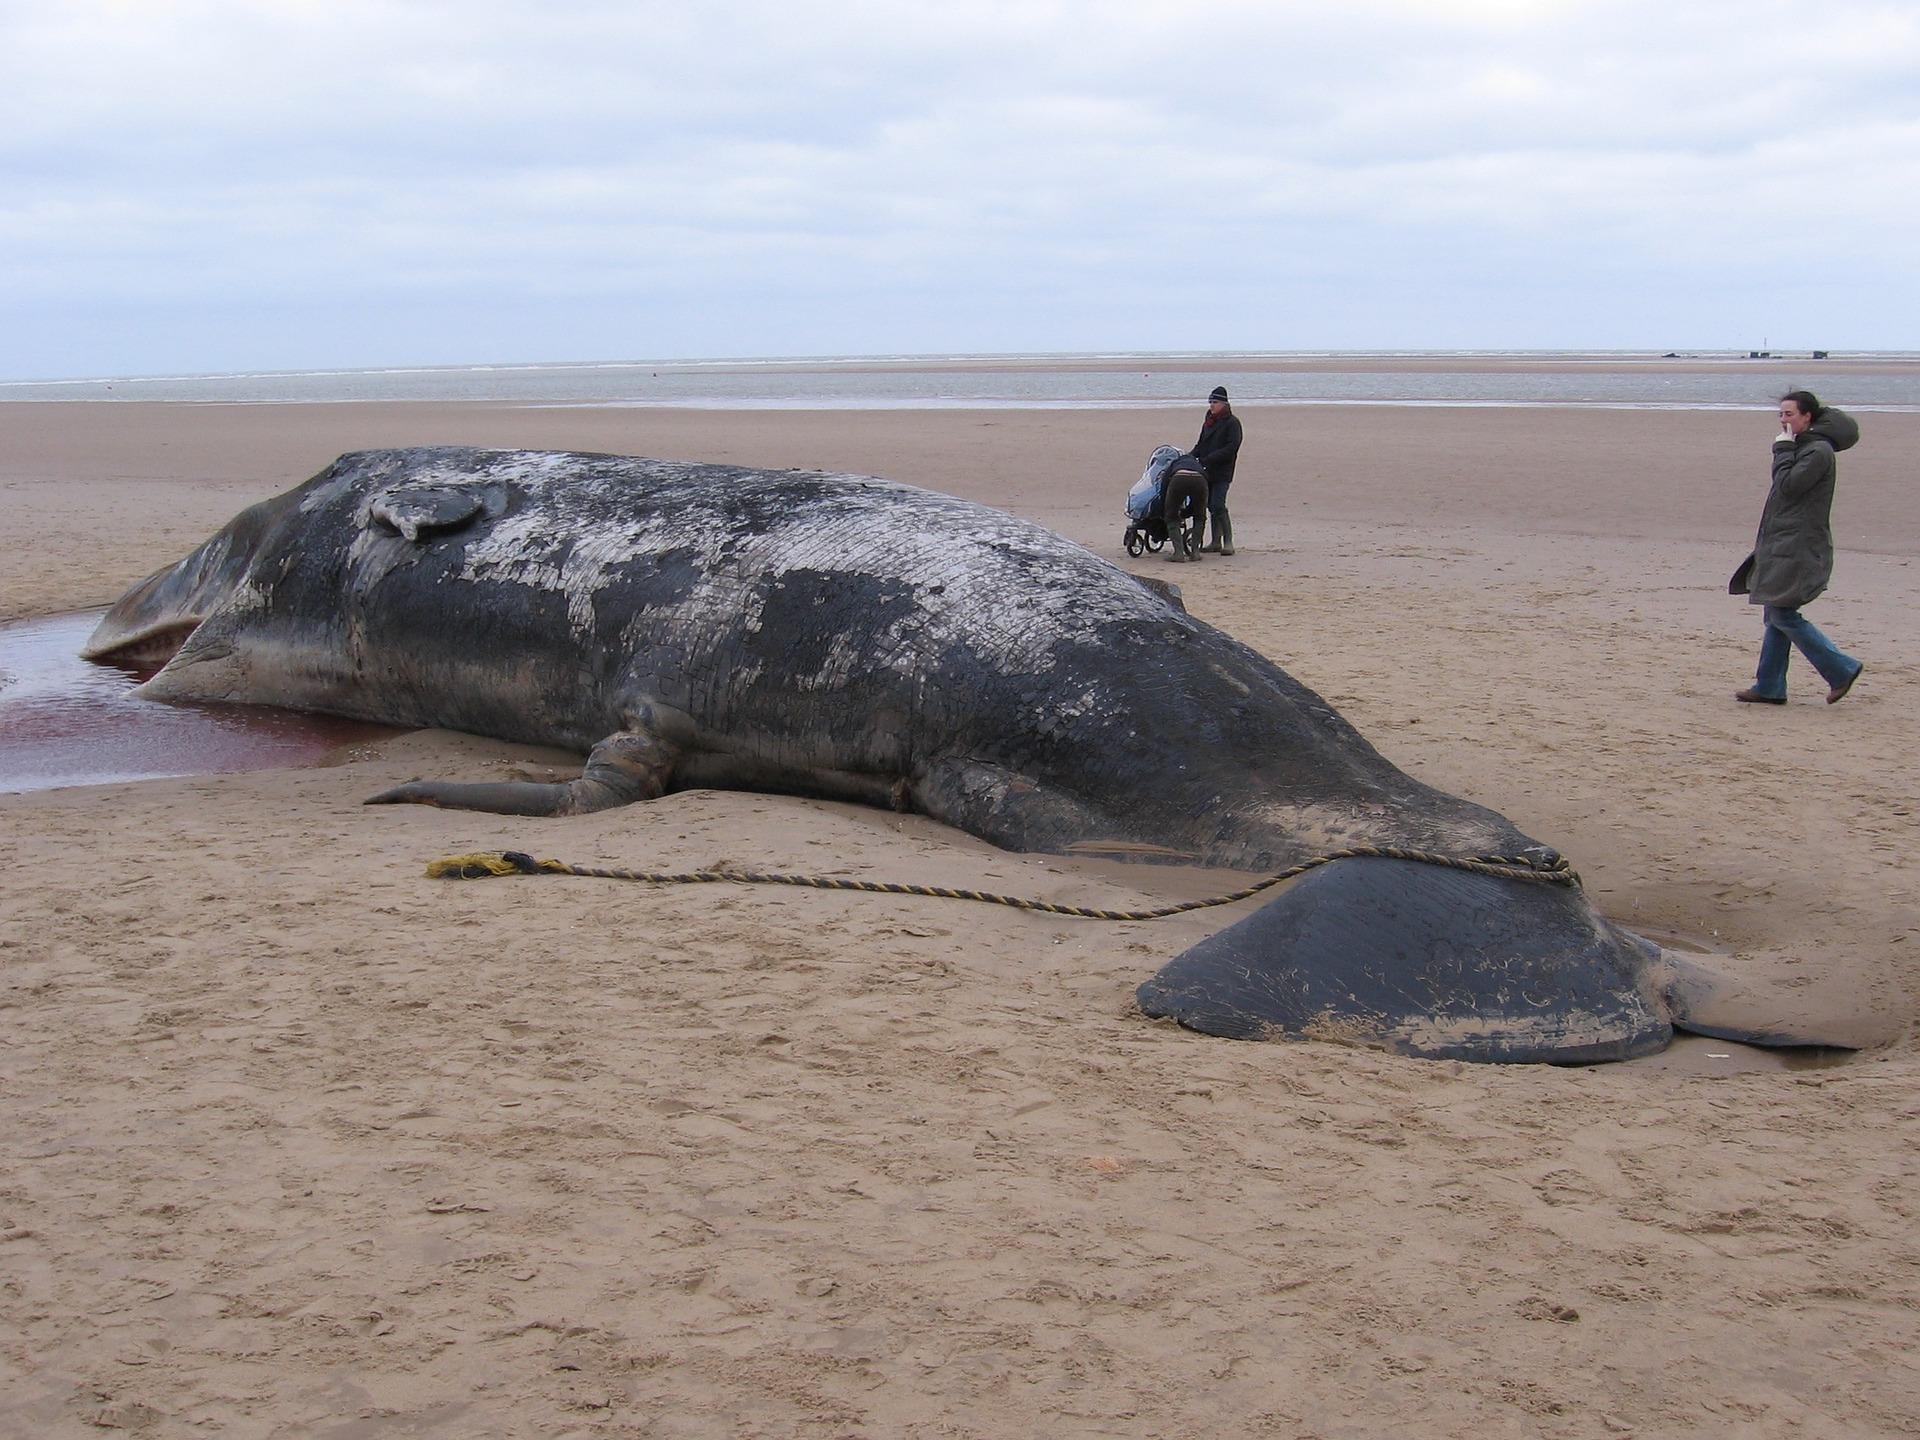 sperm-whale-904349_1920.jpg